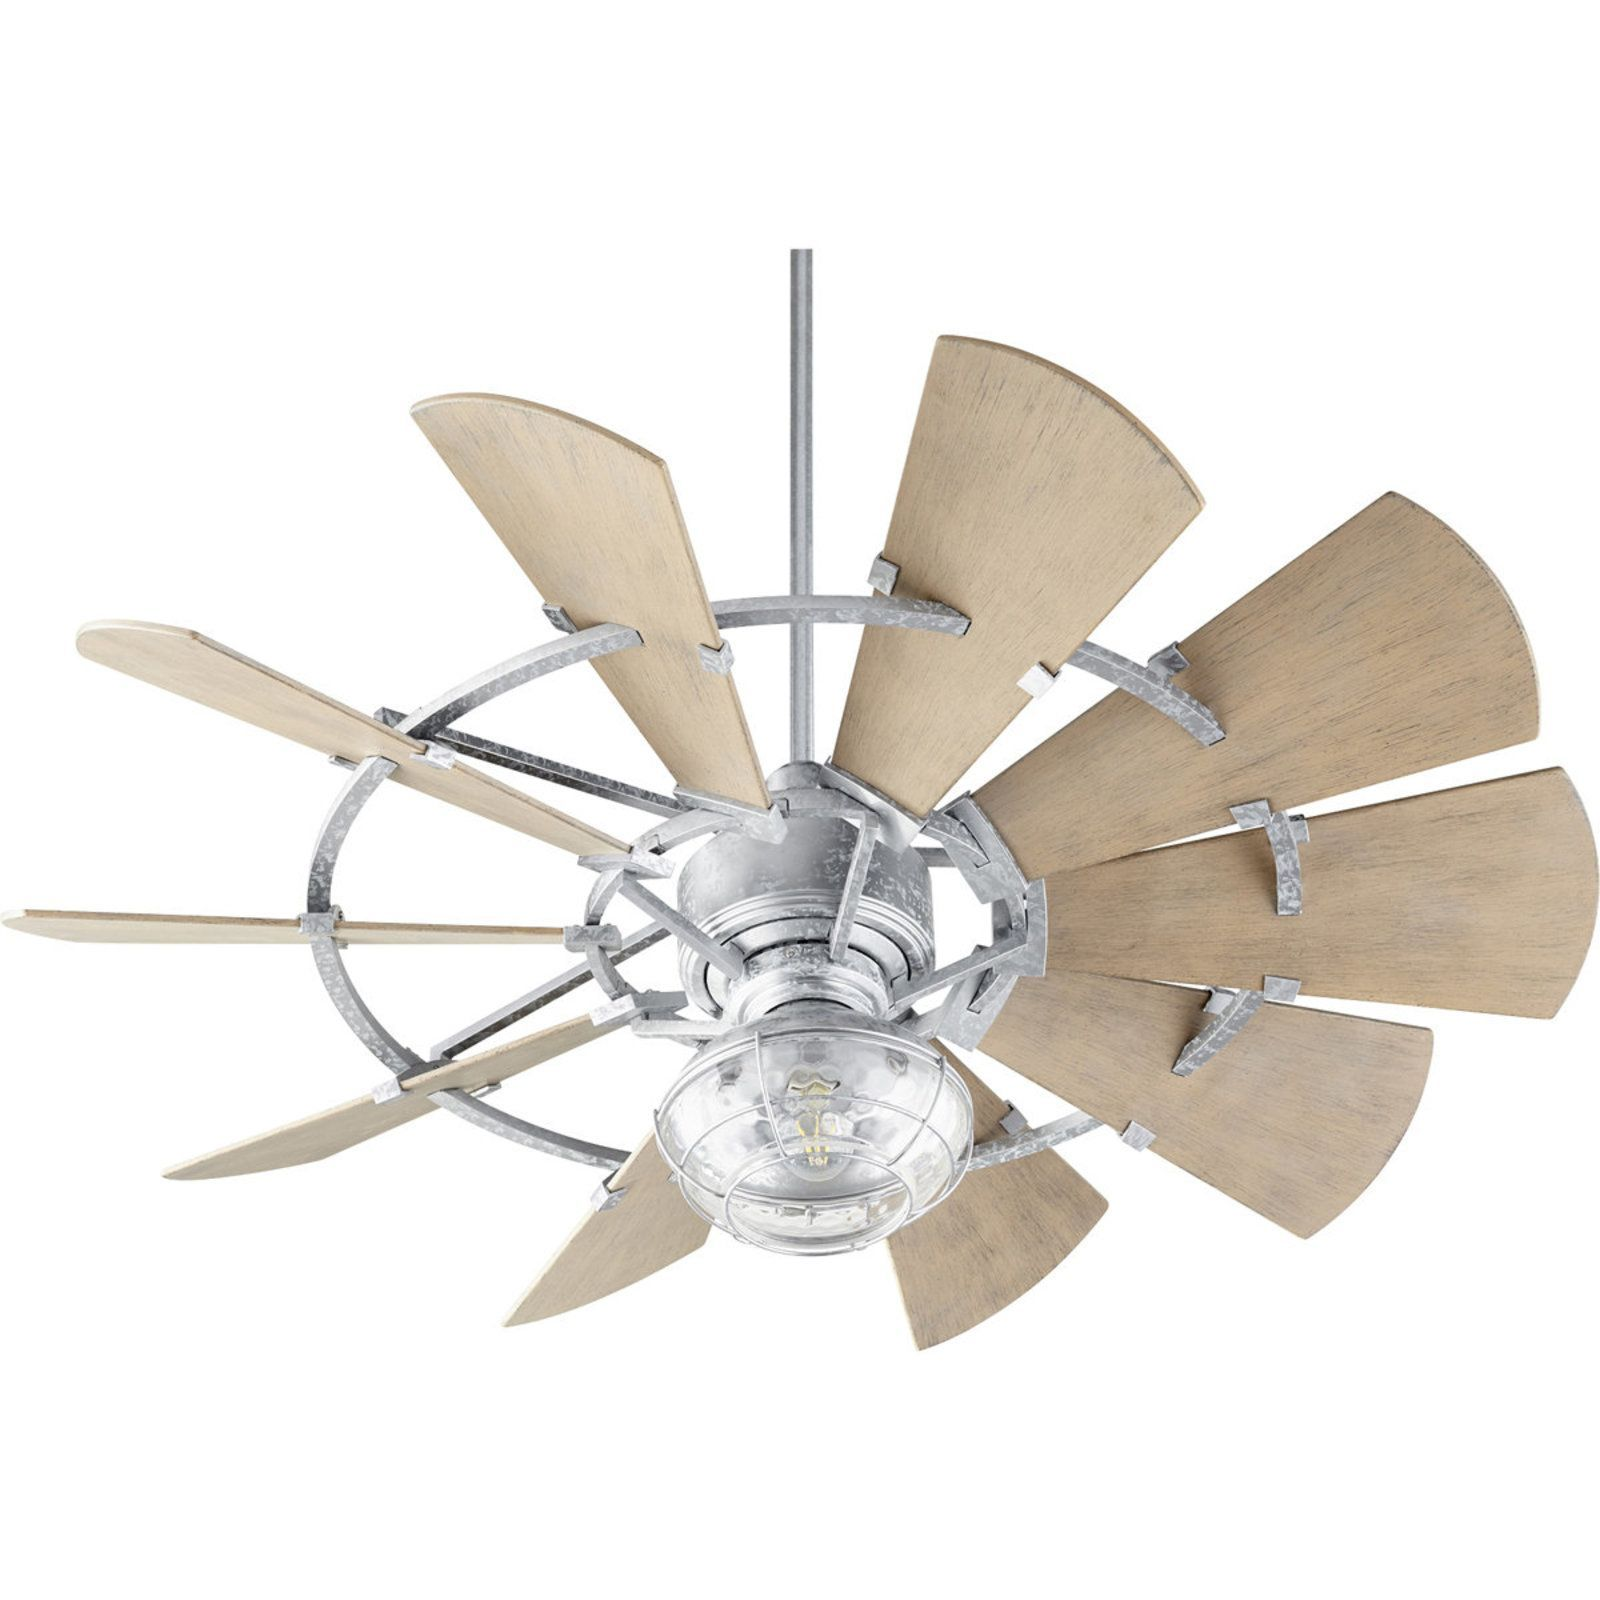 52 Rustic Windmill Ceiling Fan Windmill Ceiling Fan Ceiling Fan Ceiling Fan Shades